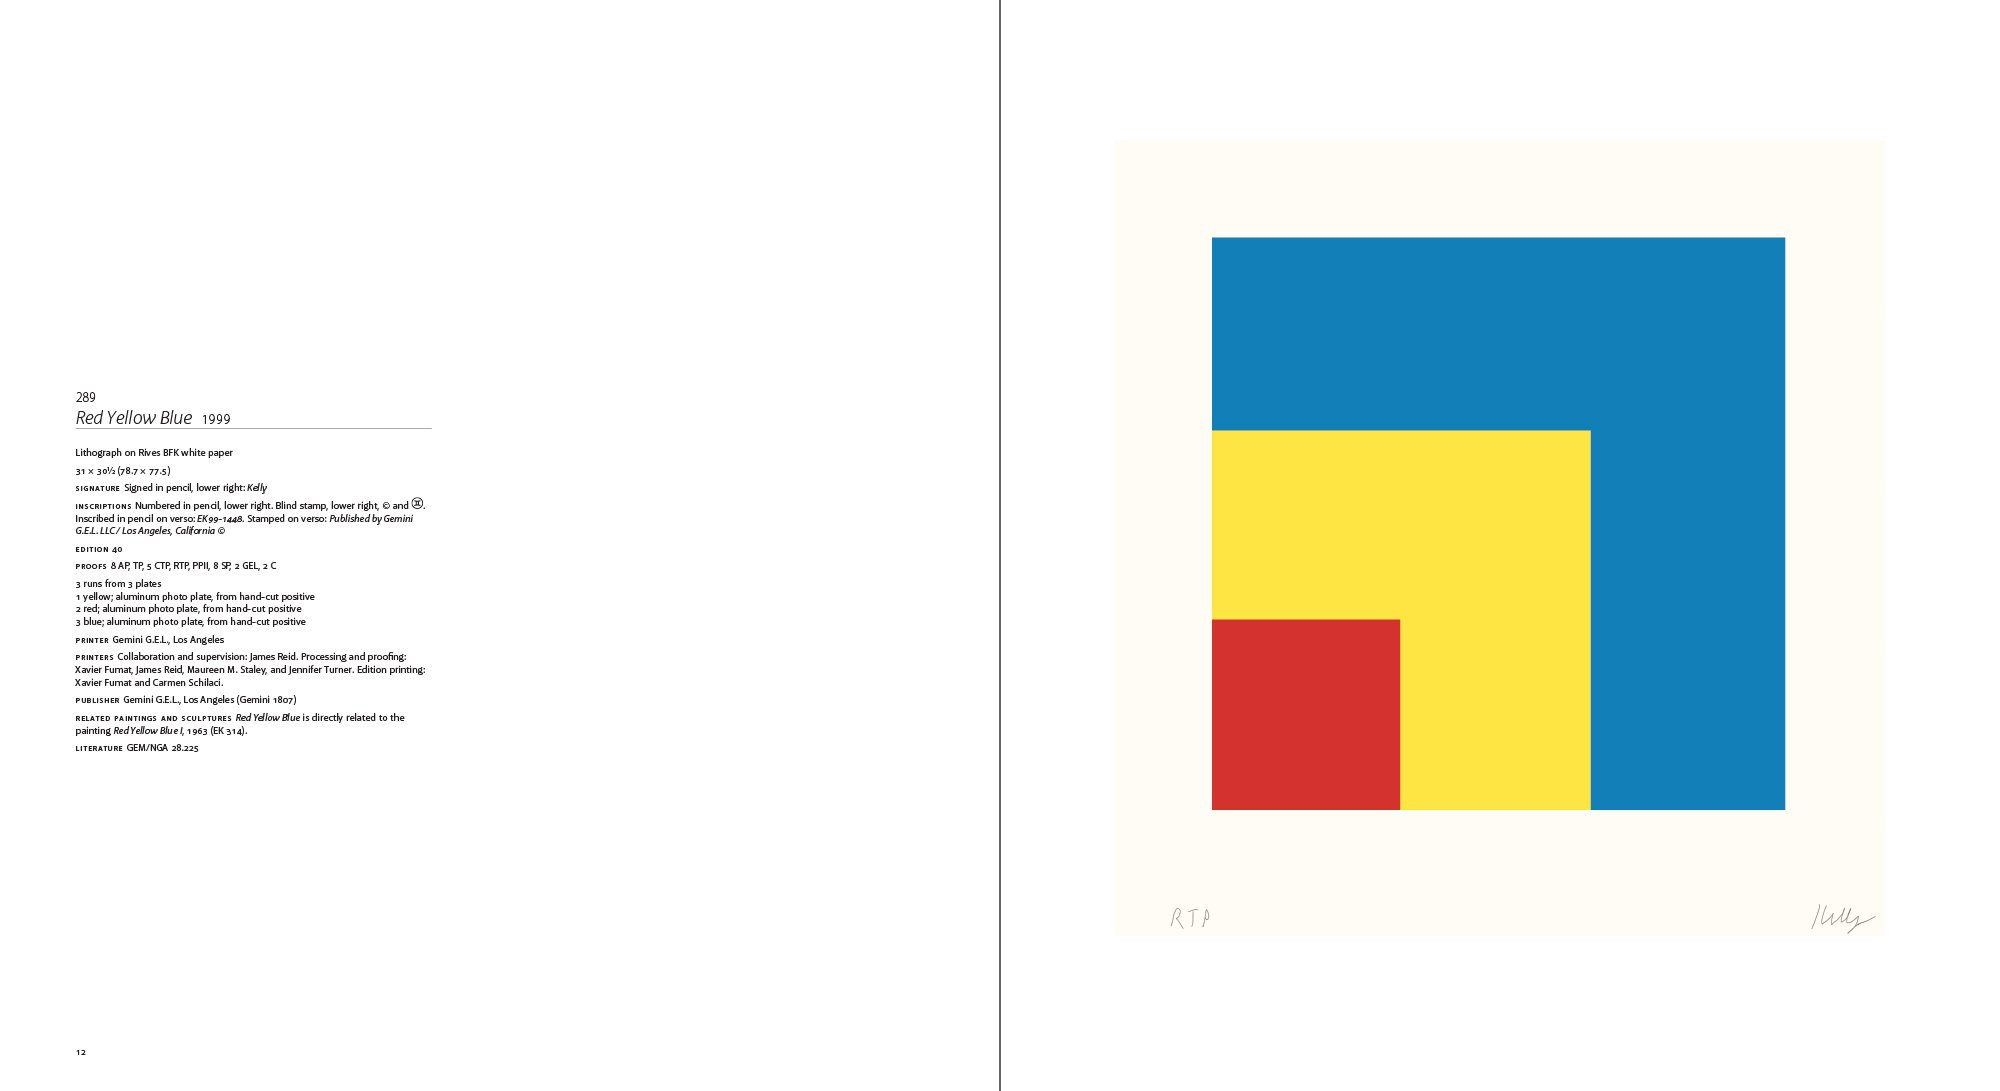 Xavier color printing - The Prints Of Ellsworth Kelly A Catalogue Raisonn Richard H Axsom 9780984986422 Amazon Com Books